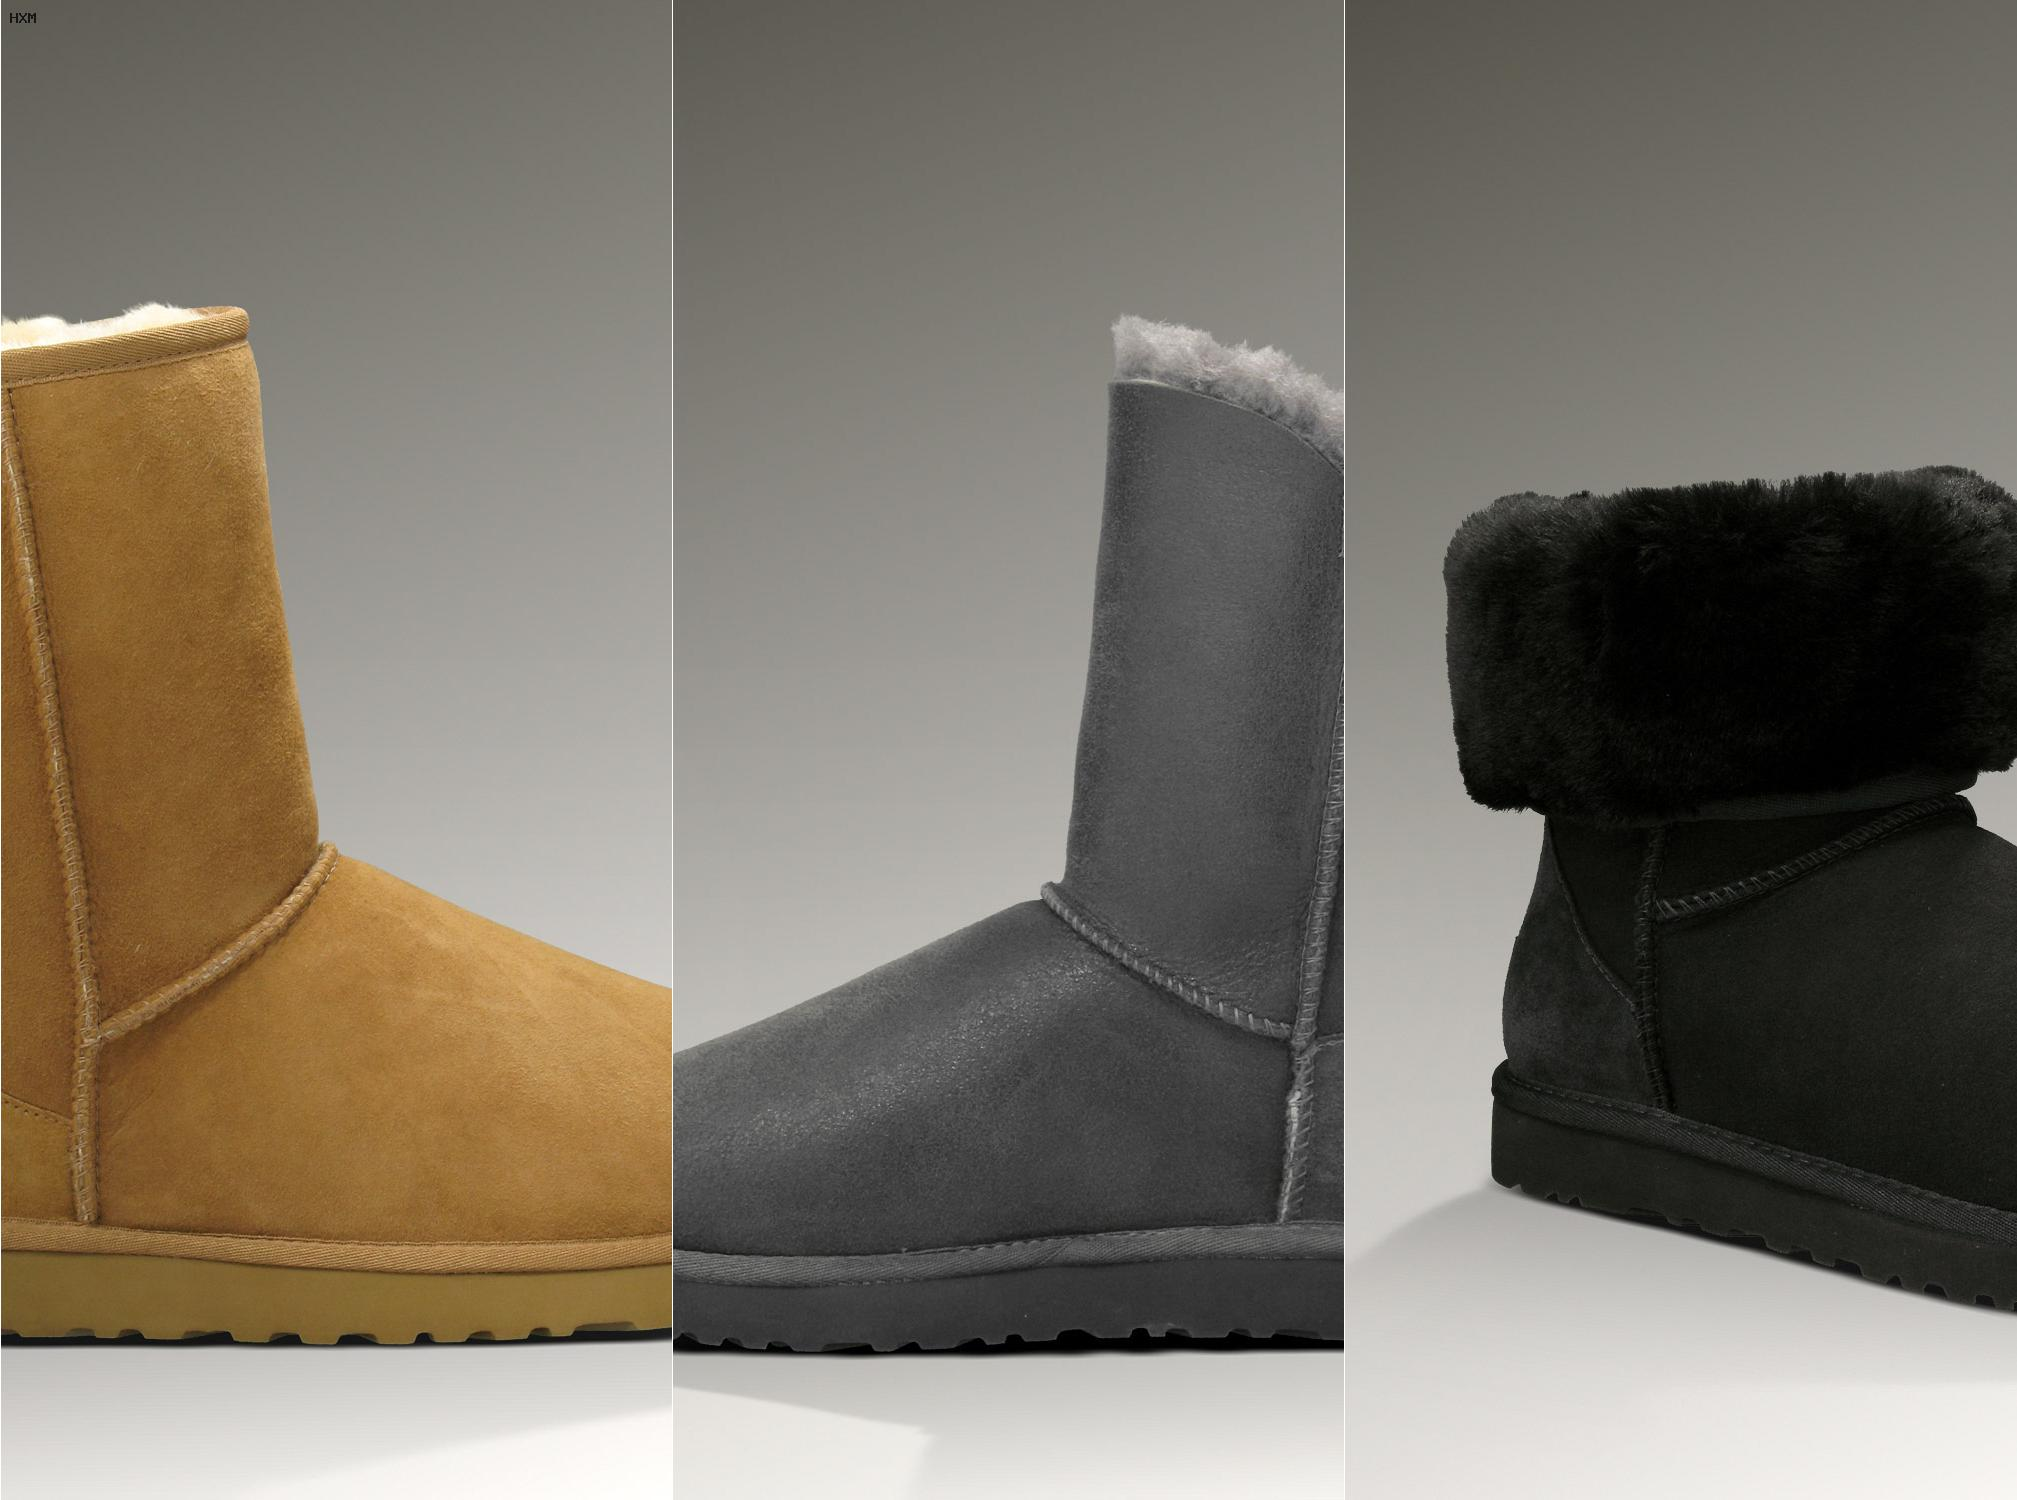 buy ugg slippers online